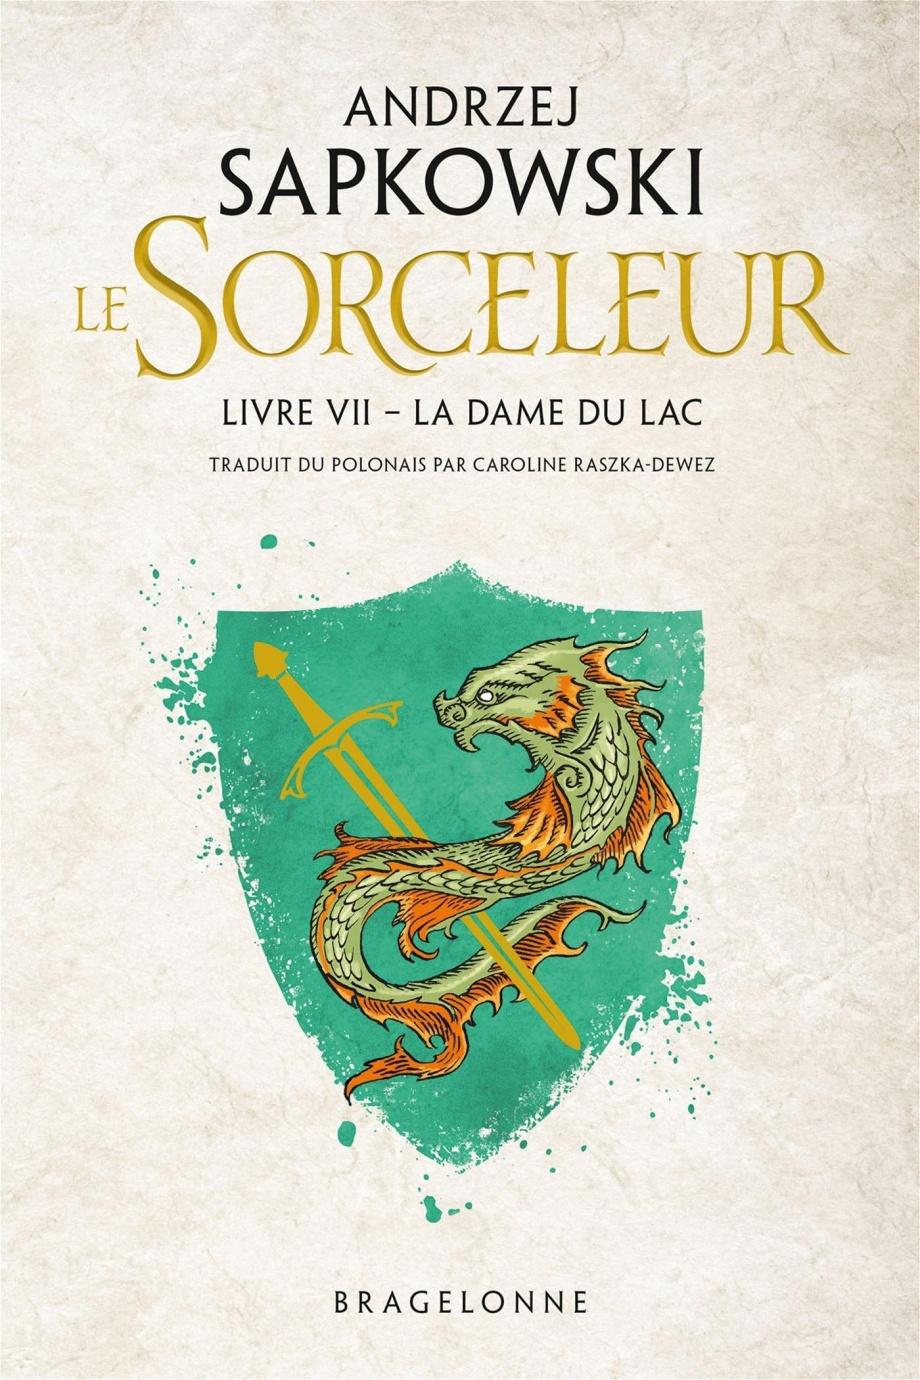 La Dame Du Lac (andrzej Sapkowski) : (andrzej, sapkowski), Sorceleur, Andrzej, Sapkowski, Littérature, Fantastique/SF/Horreur, Leslibraires.ca